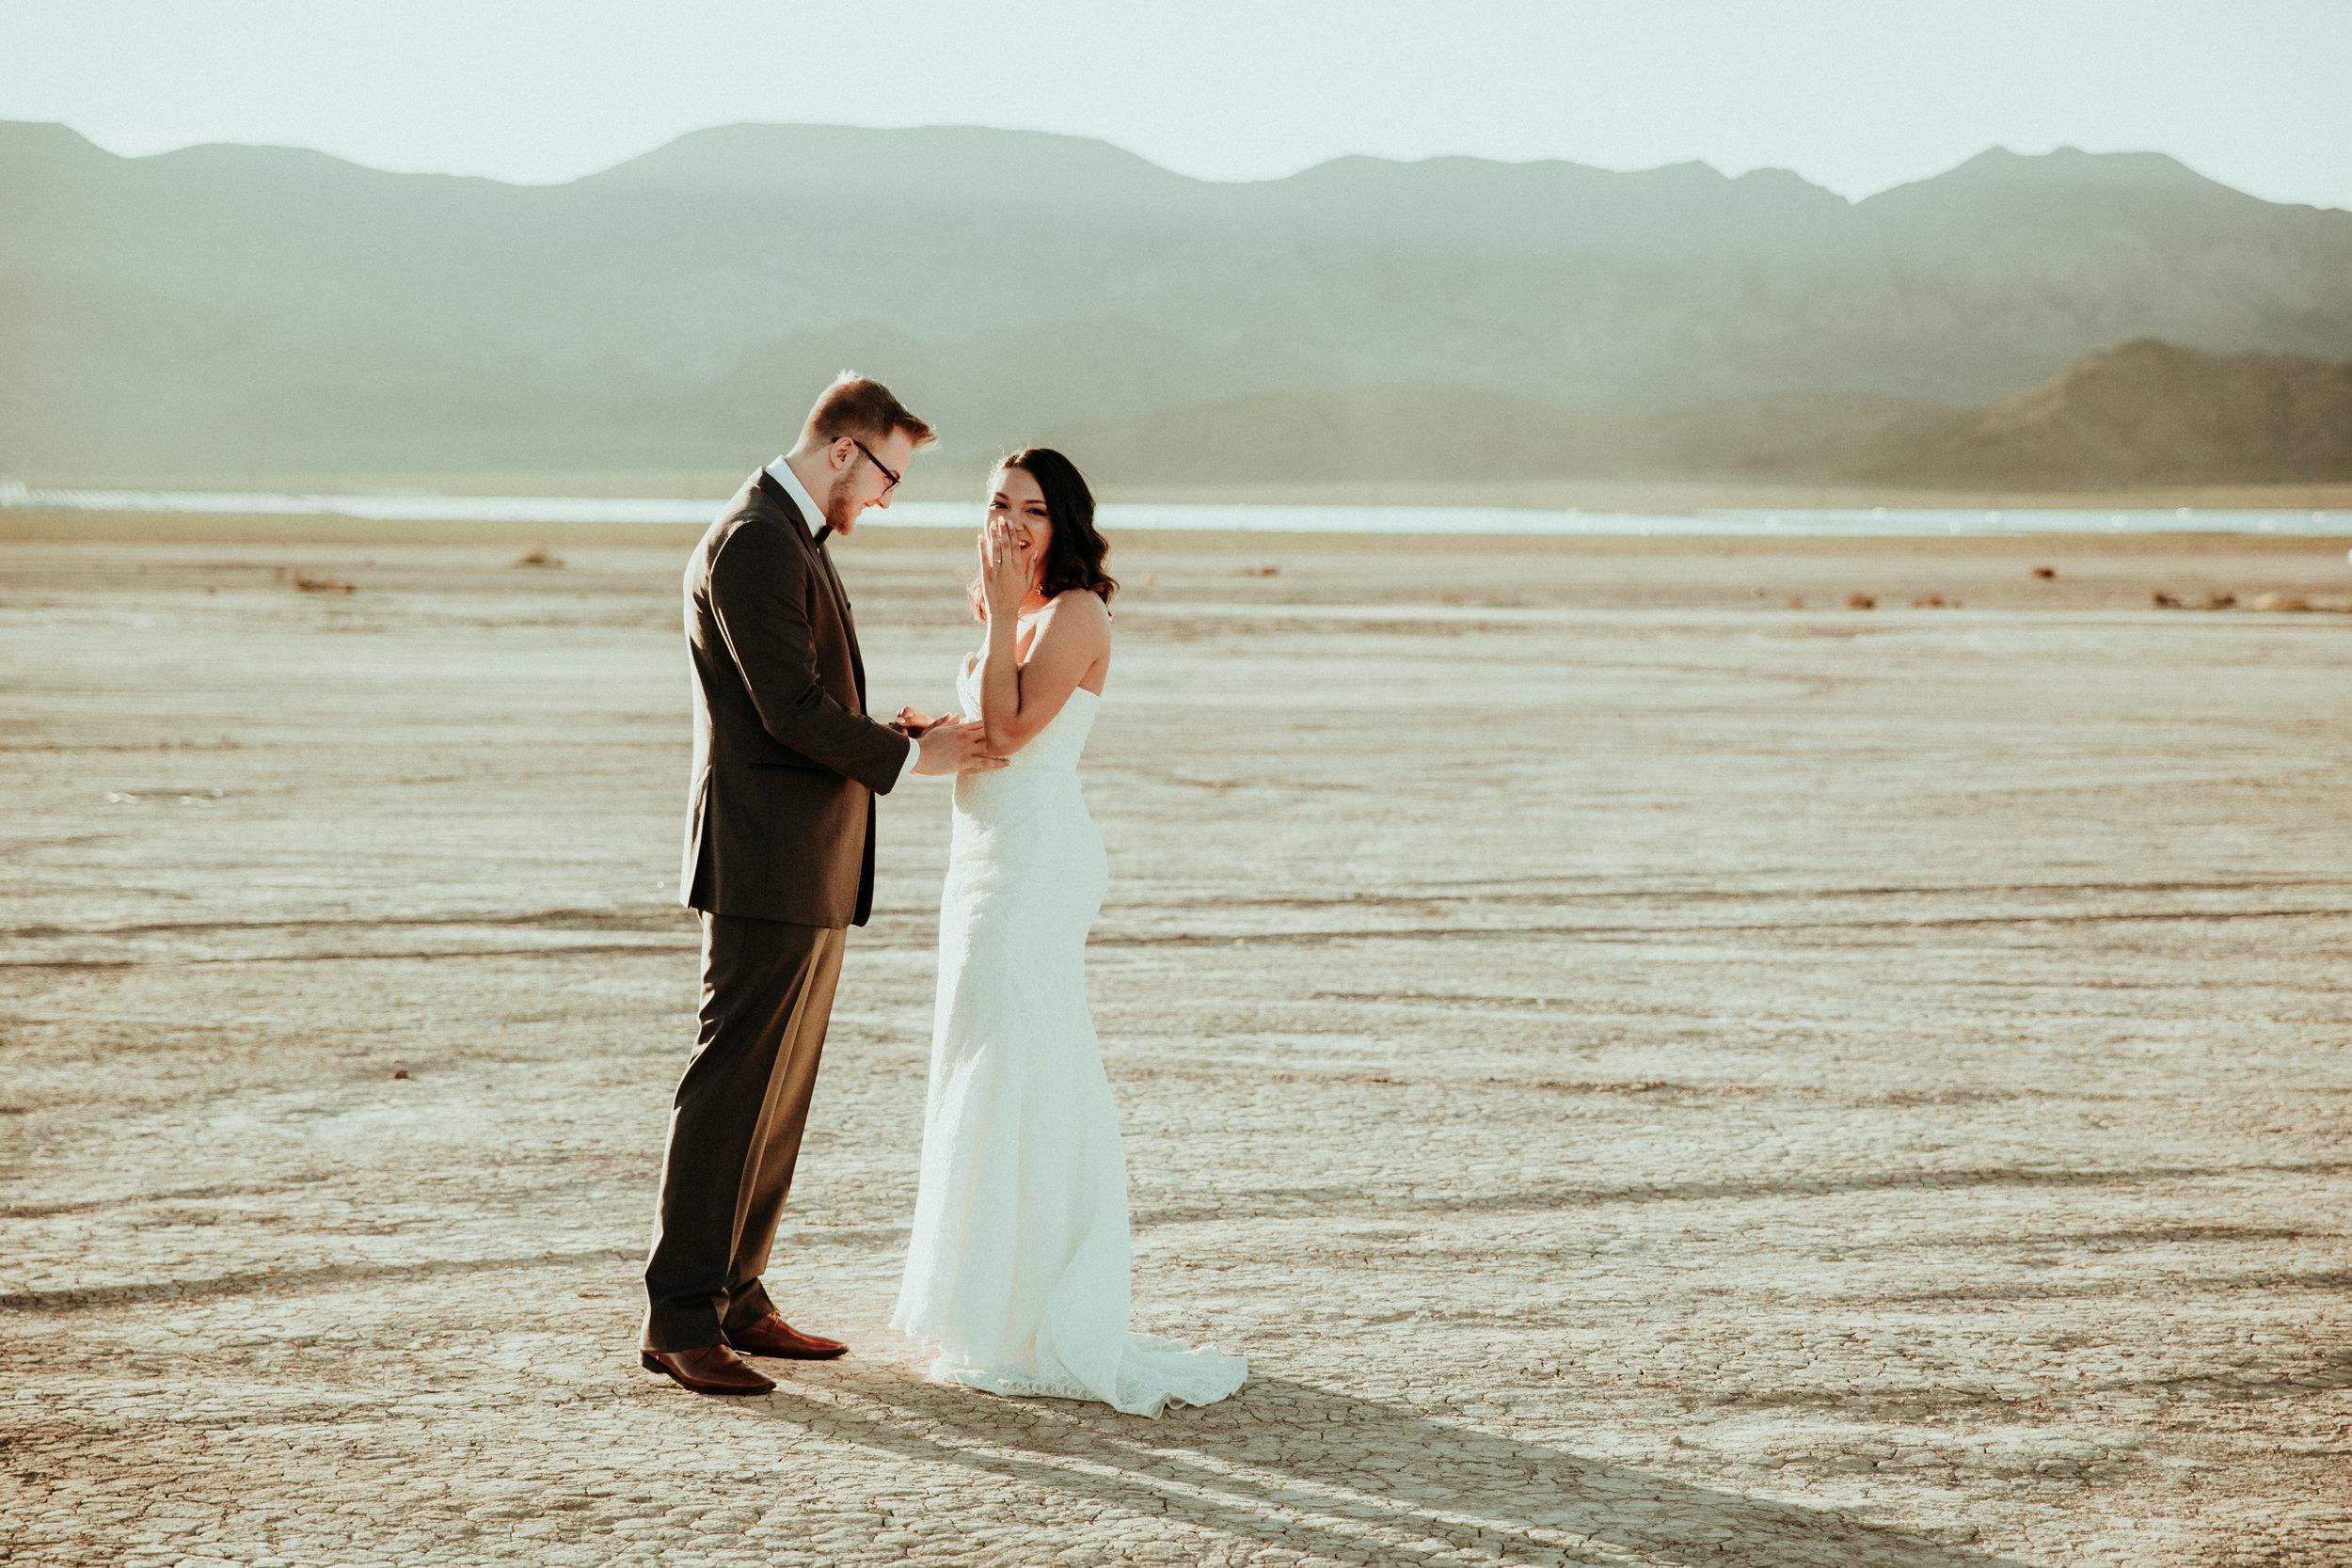 Daniel + Jessica - Henderson, NV - Las Vegas Wedding - Elopement Photographer - Seattle Wedding Photographer - First Look